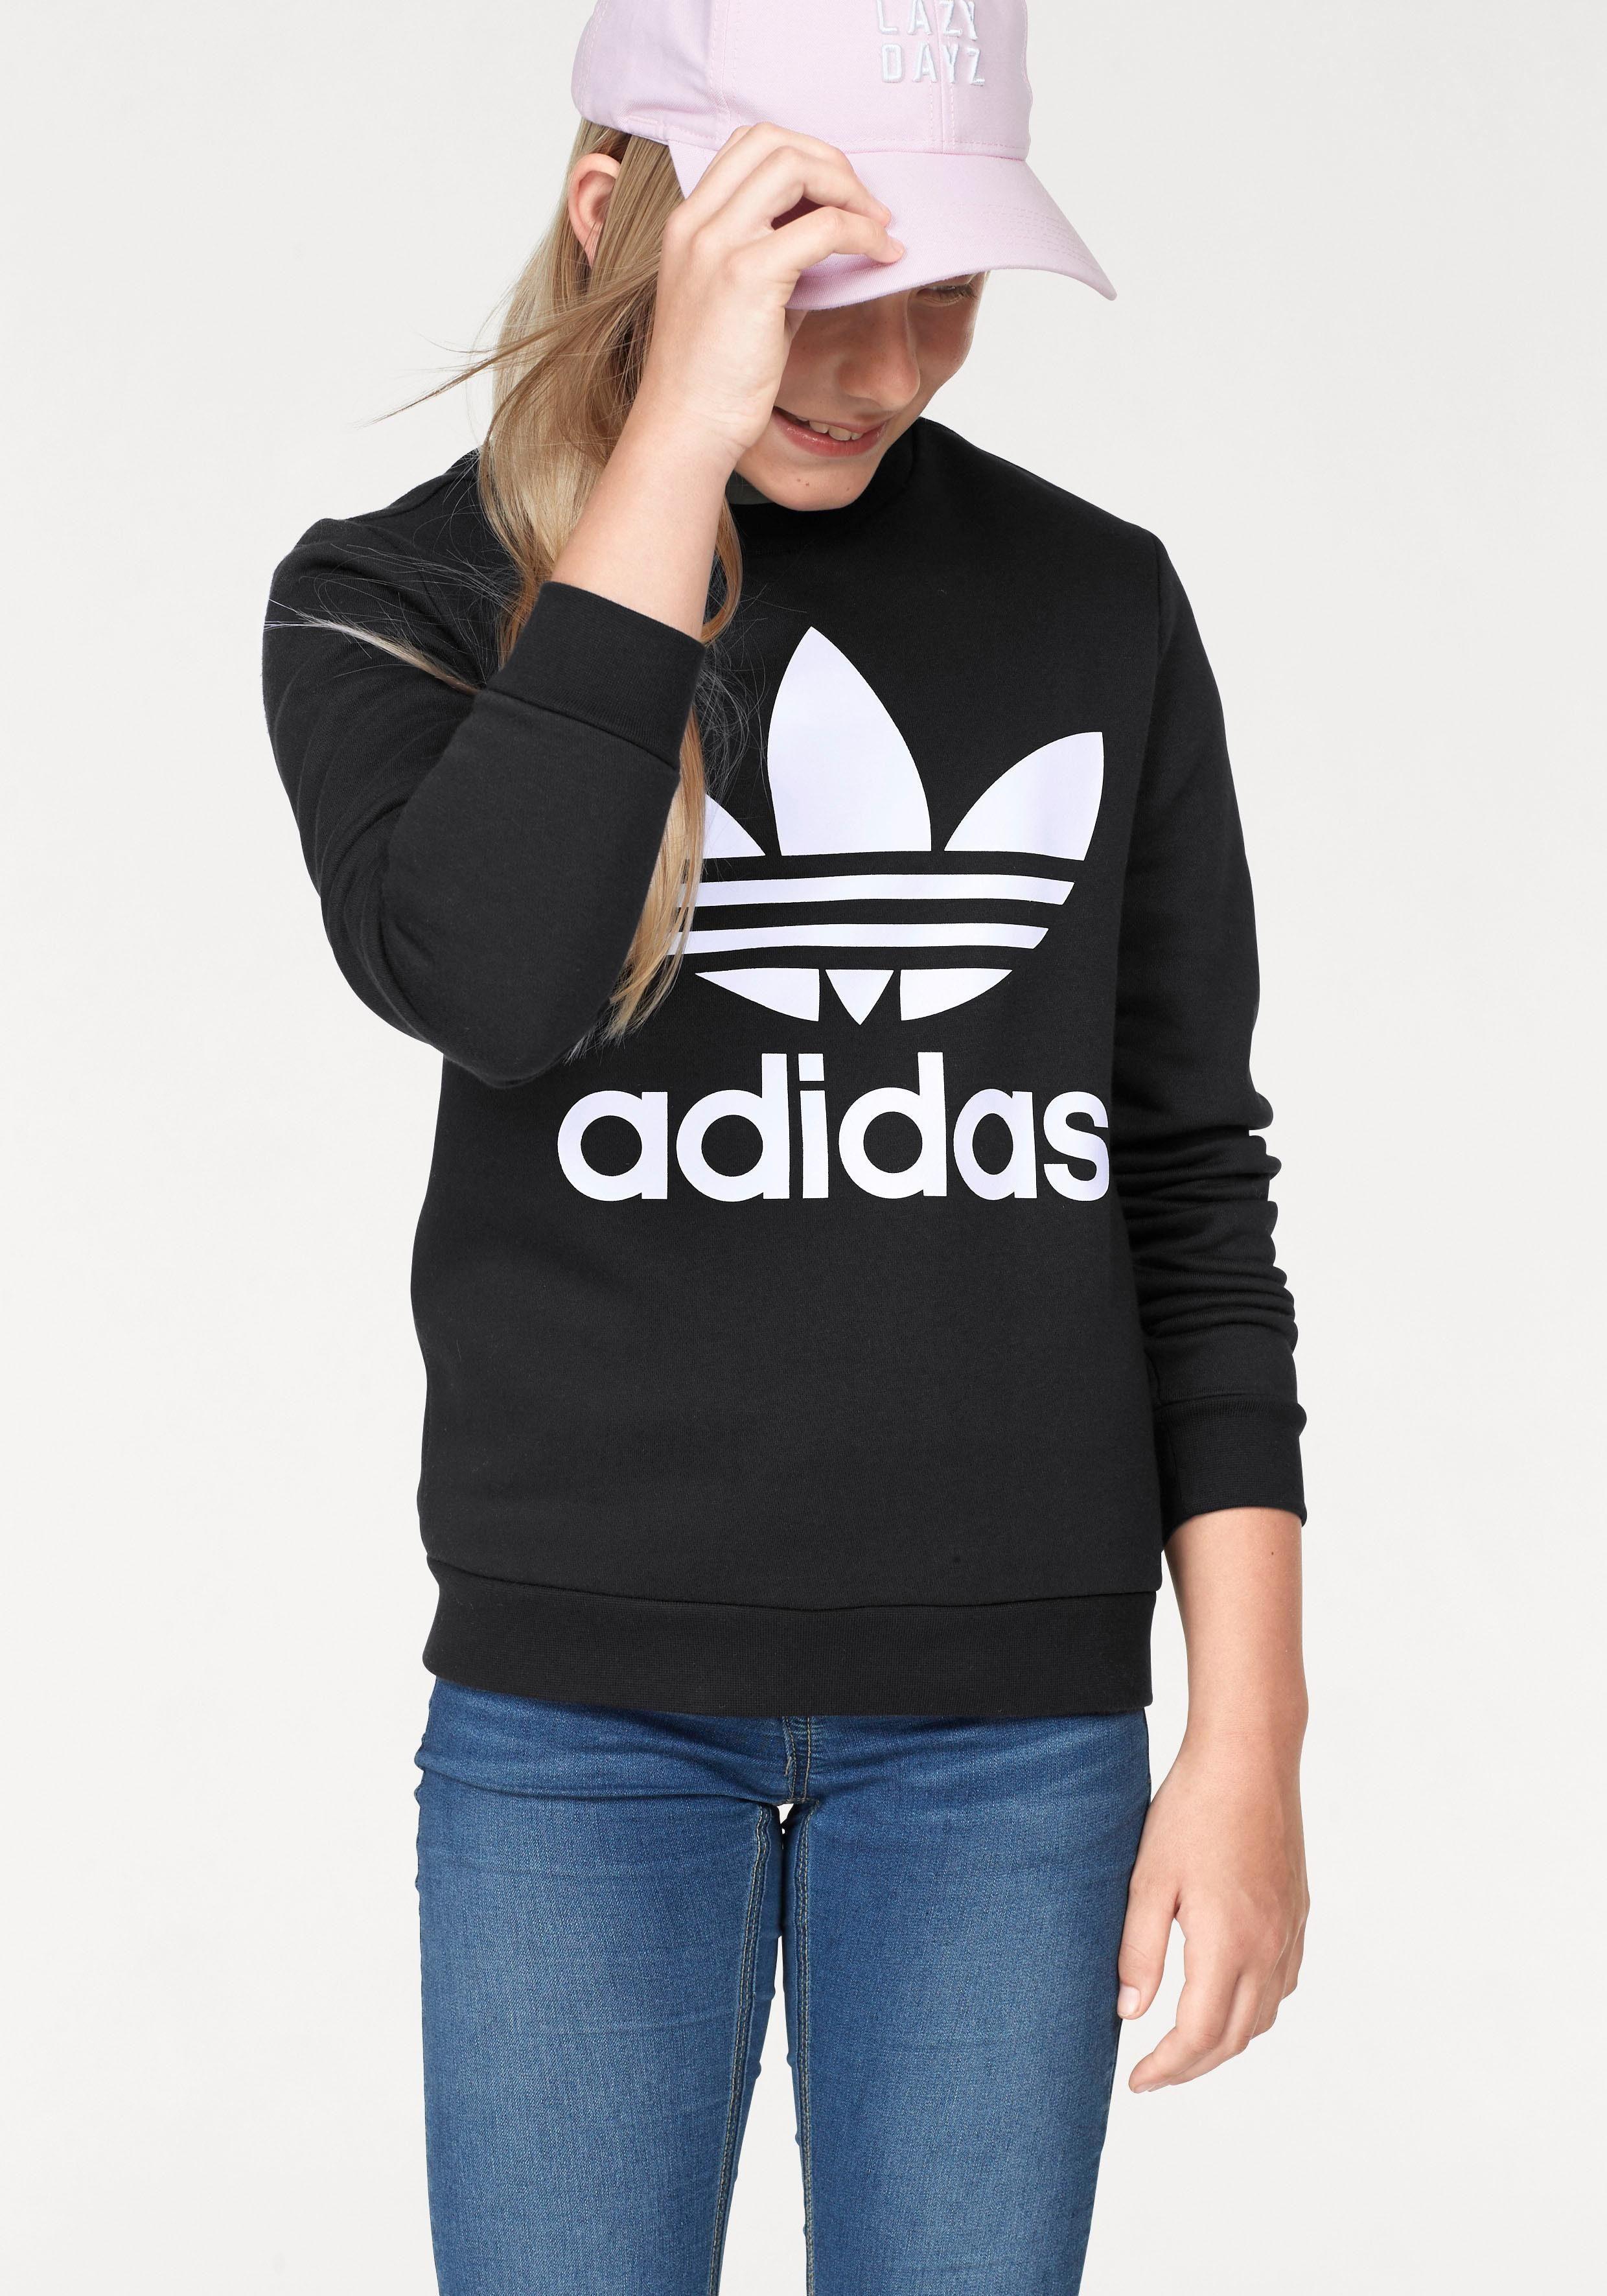 adidas Originals Свитшот »JUNIORW CREW« für Девушки und Юноши